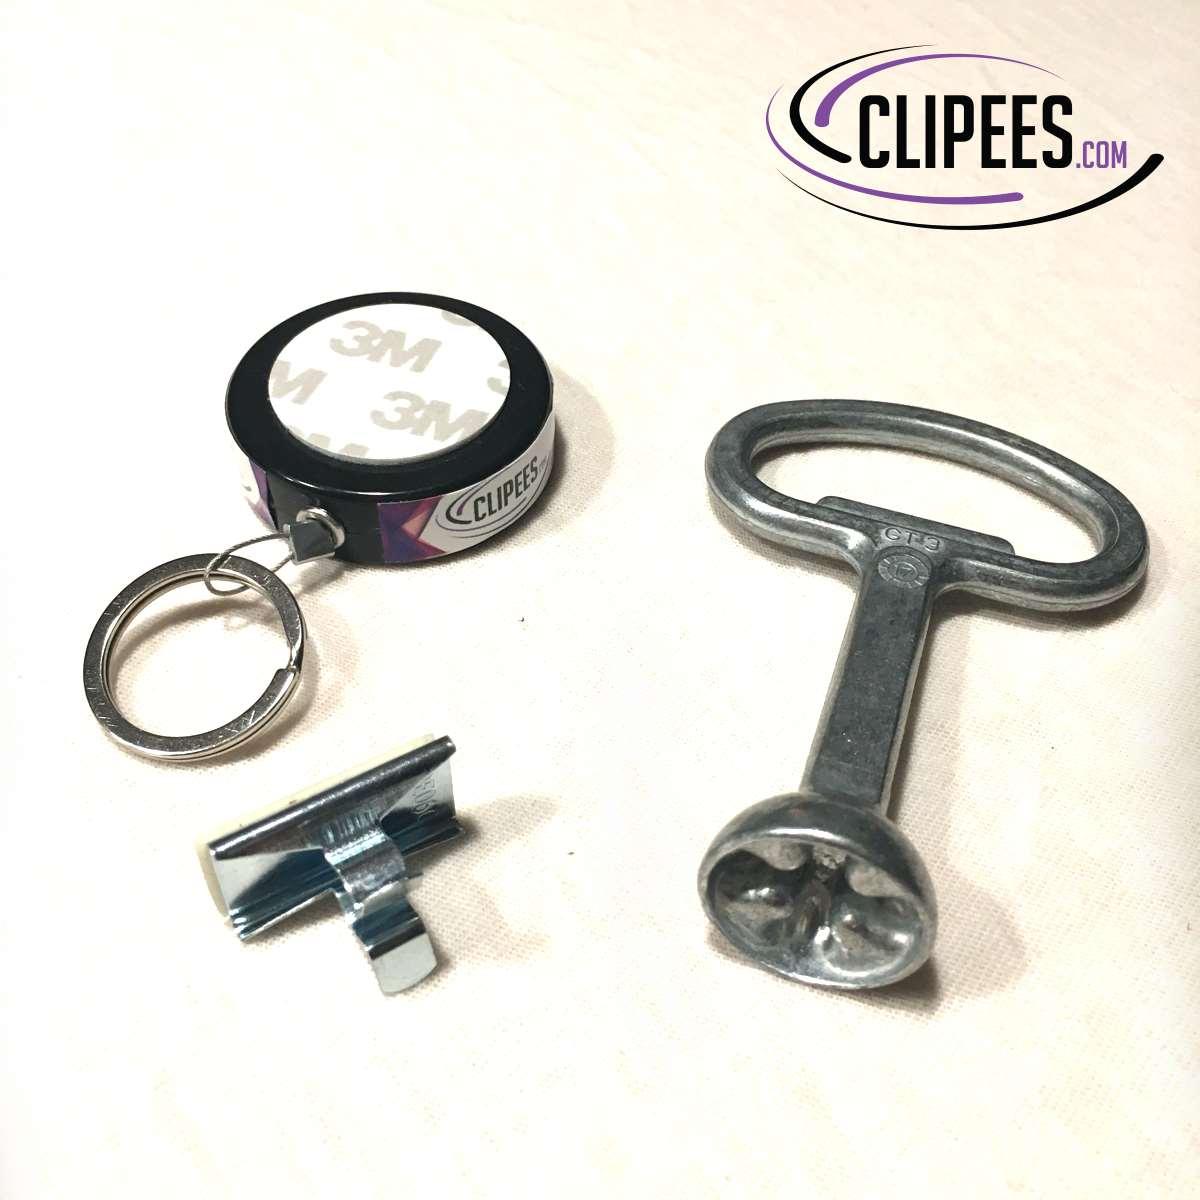 Rittal HD Enclosure lock key Clipees kit black